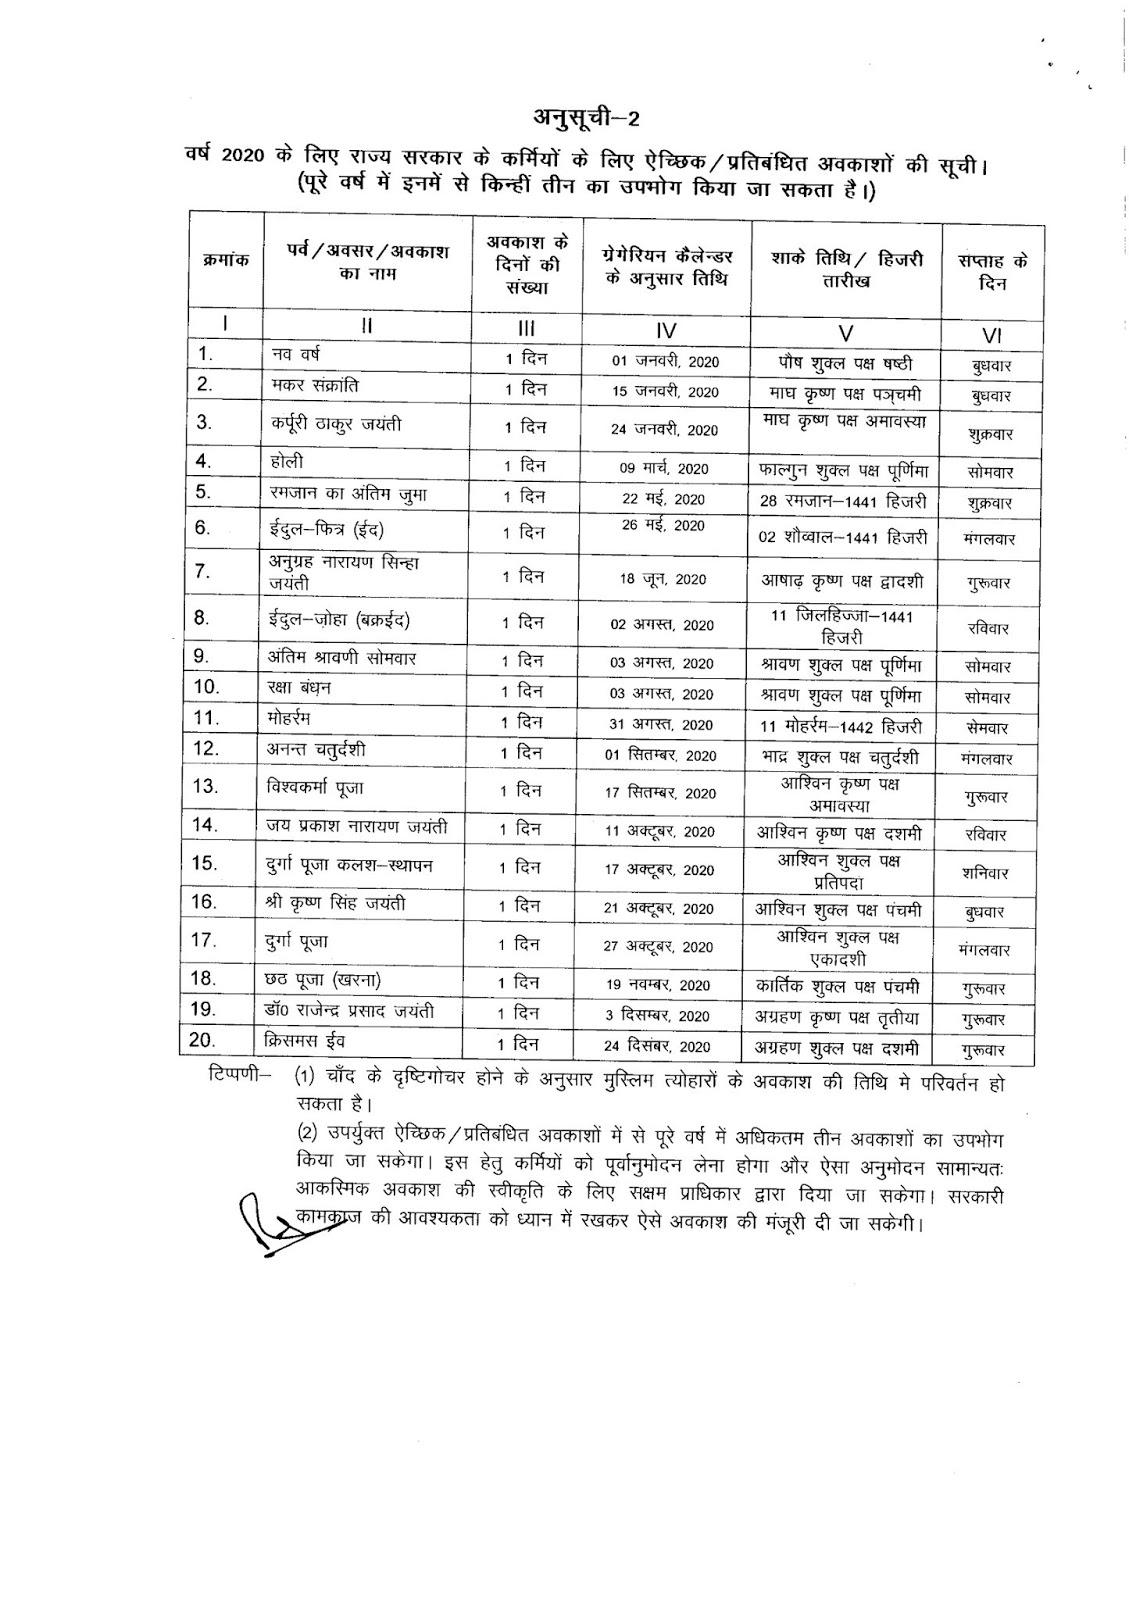 Bihar Government Calendar 2020 #educratsweb throughout Govt Of Bihar Calendar 2020